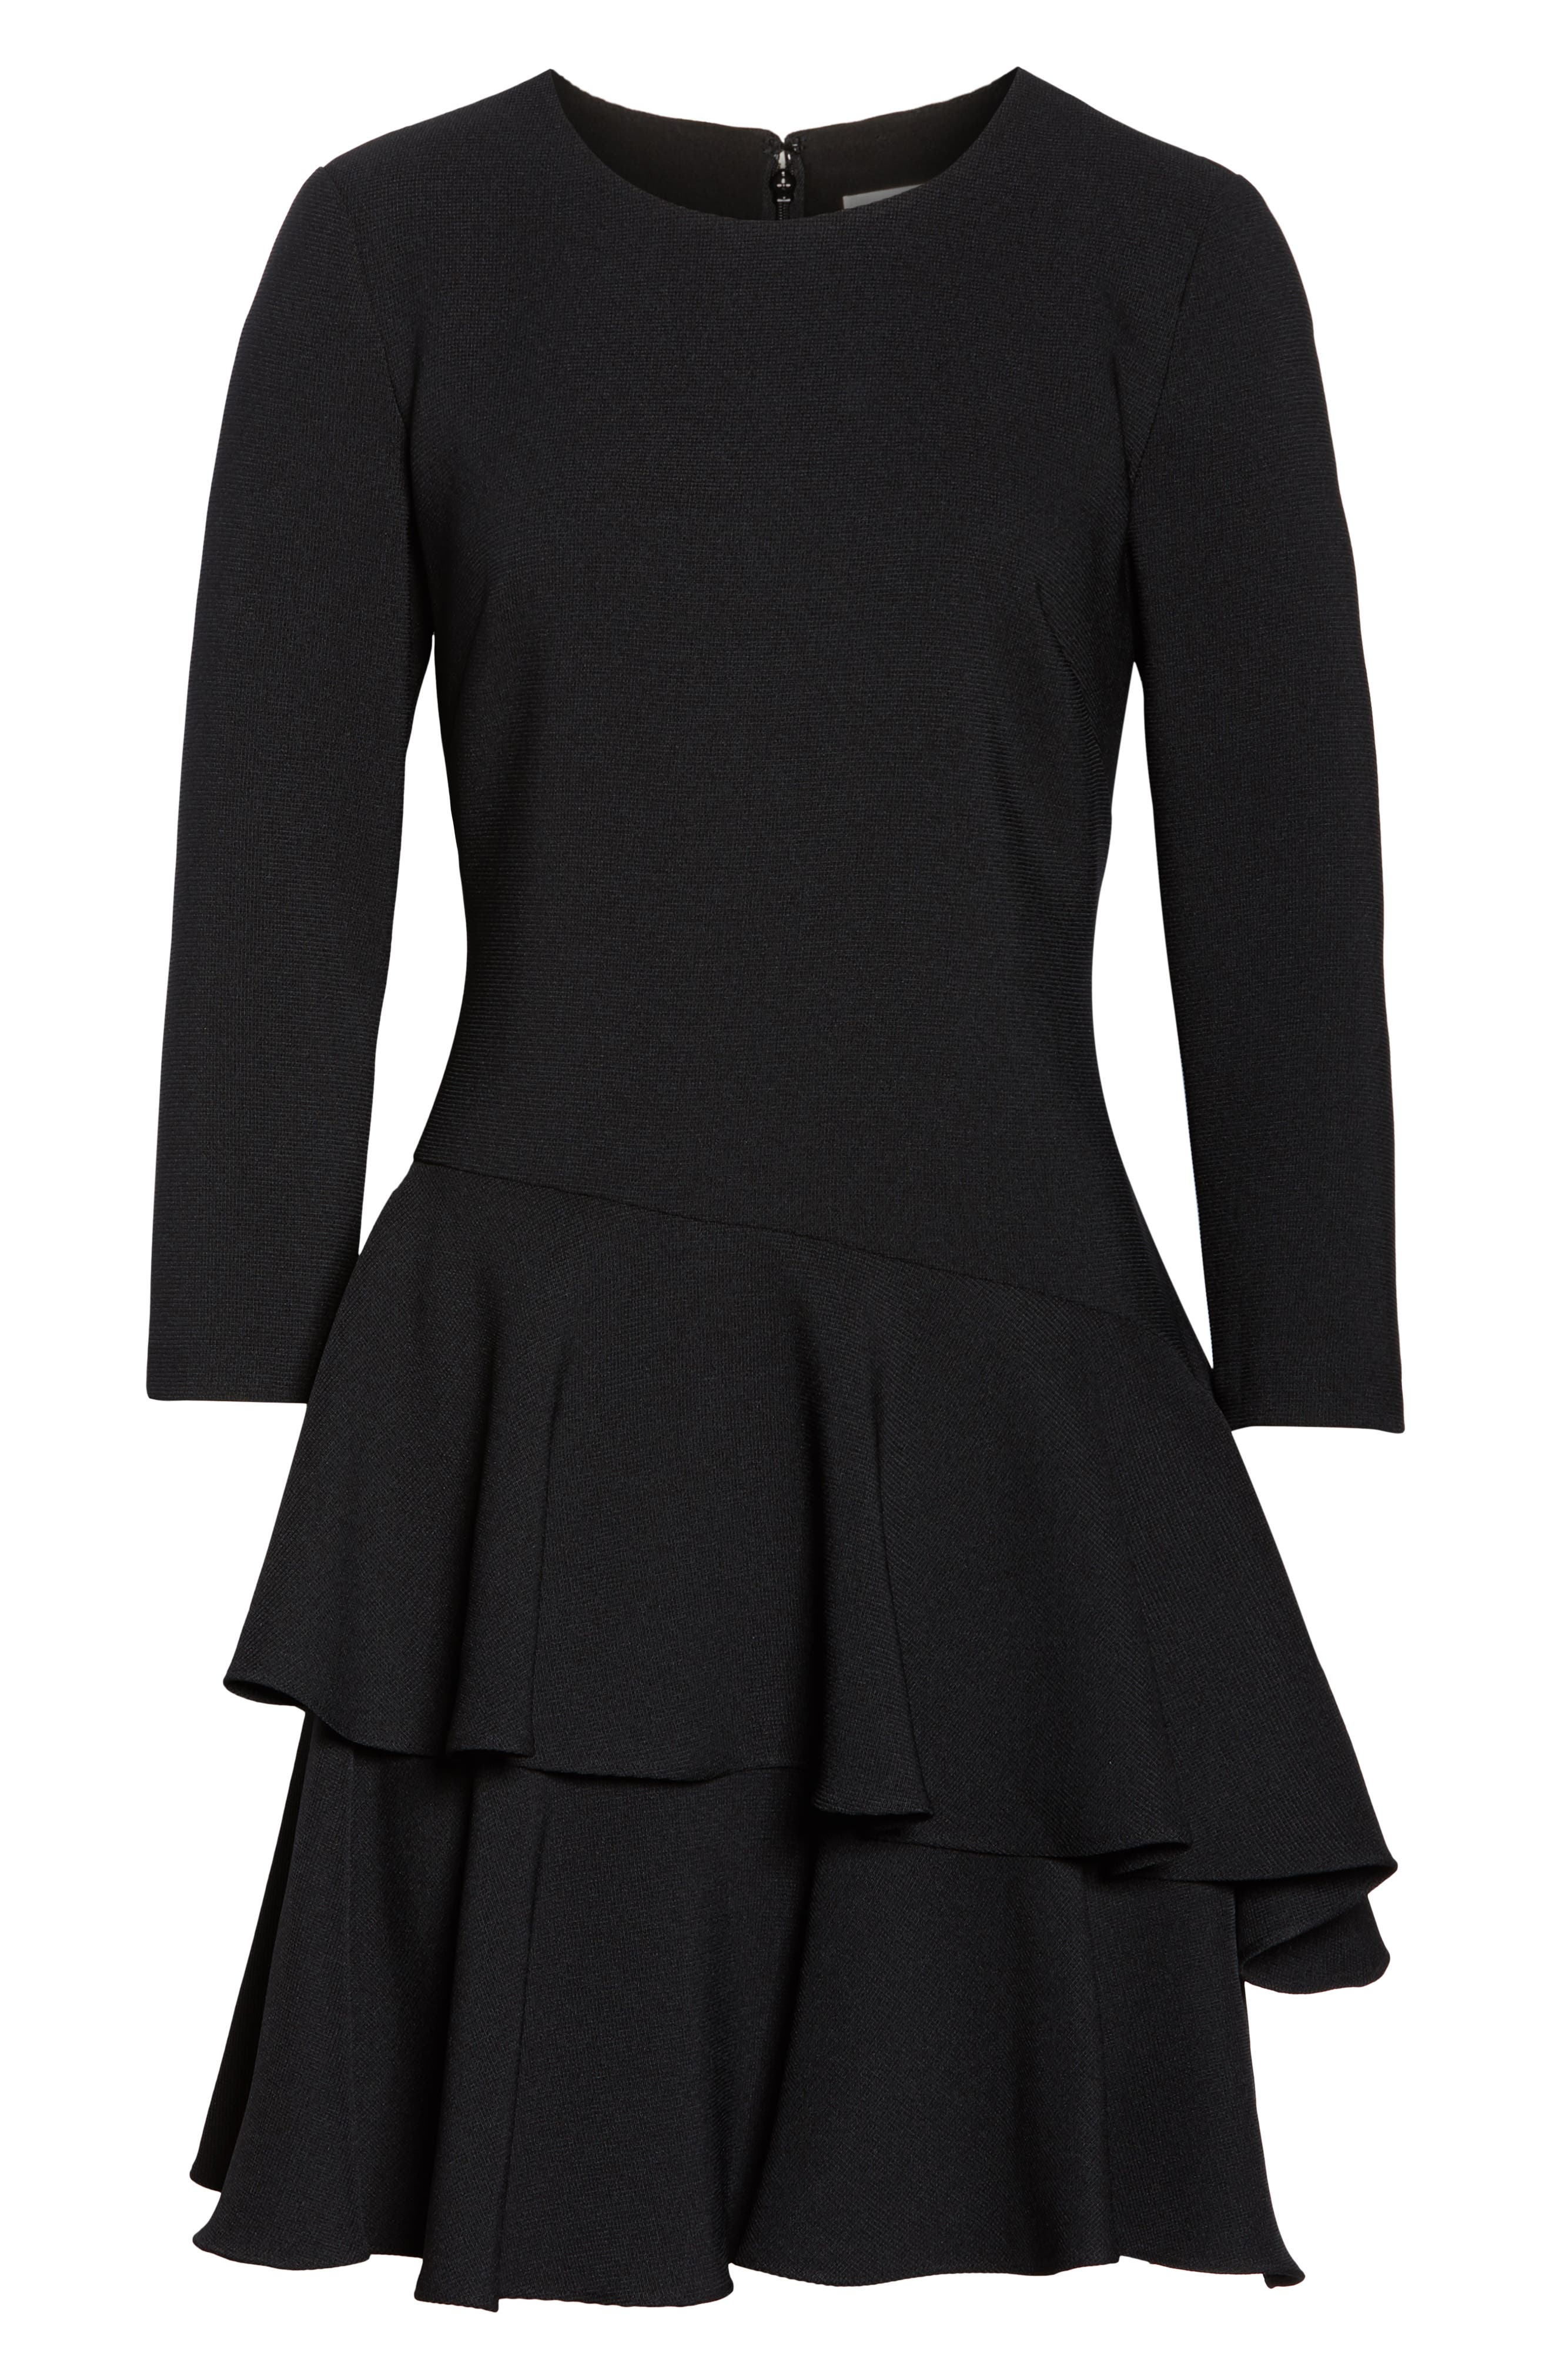 Tiered Ruffle Knit Dress,                             Alternate thumbnail 7, color,                             BLACK